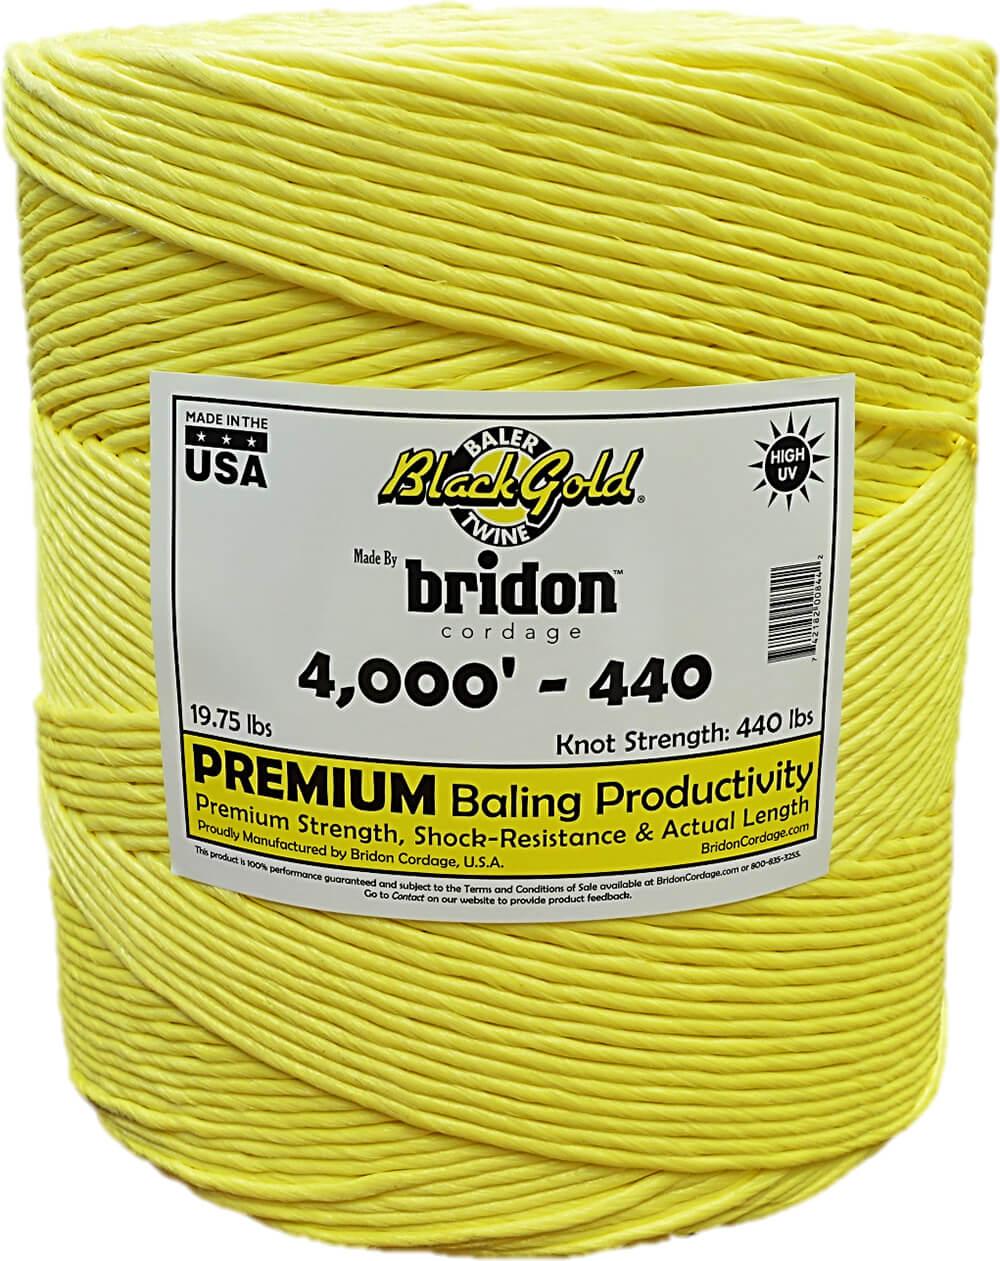 BG-4000-440Y-Spool | Bridon USA